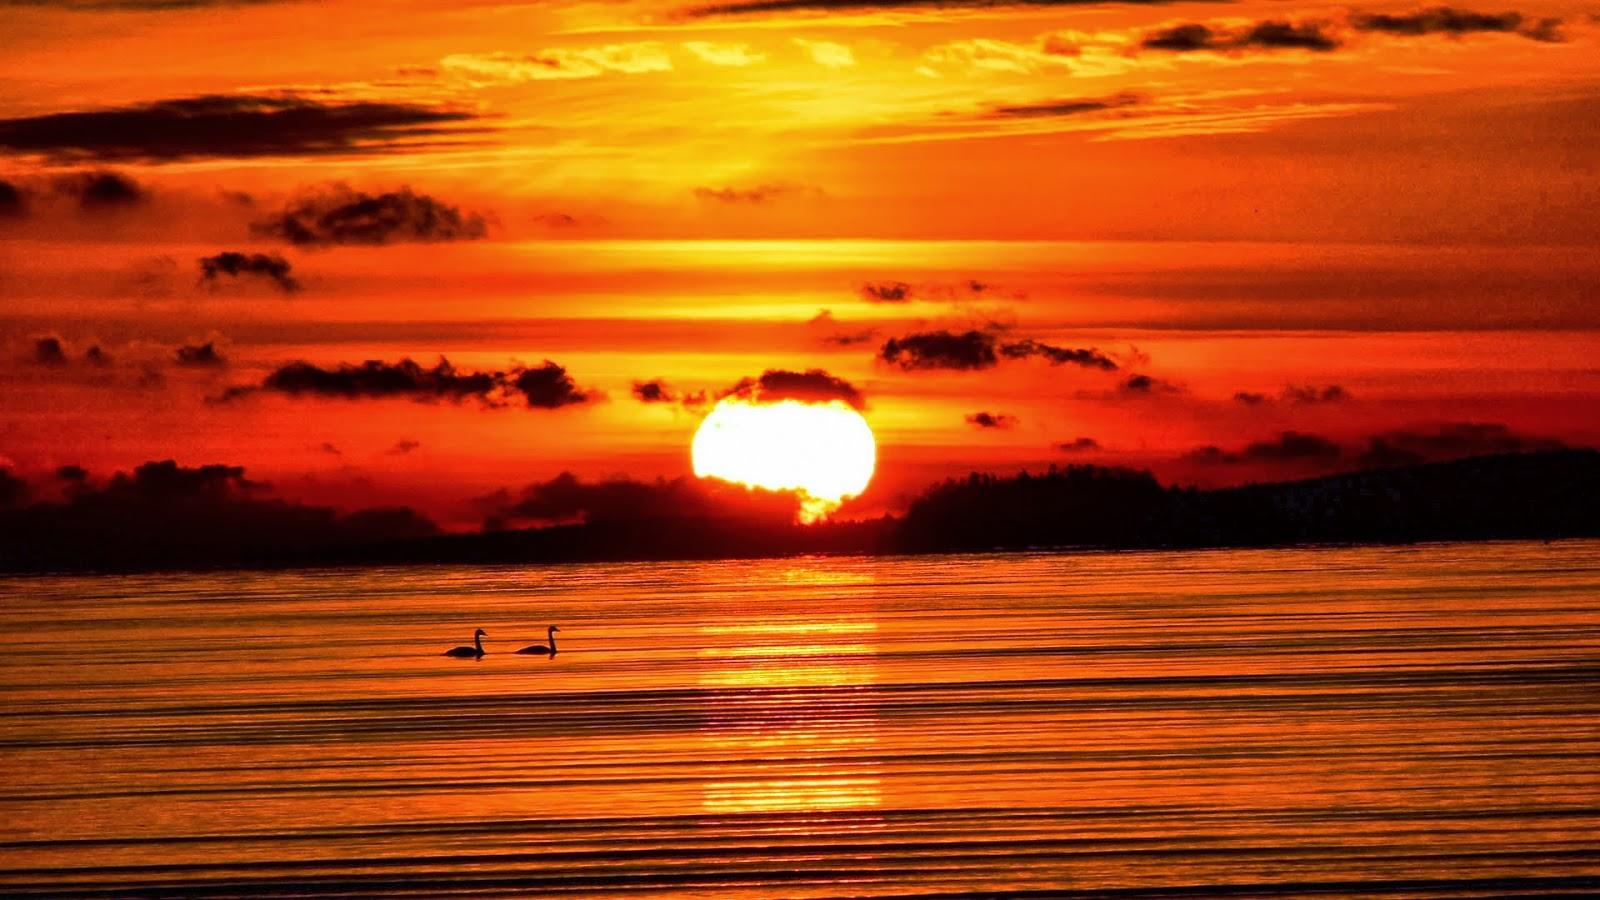 Simple   Wallpaper Horse Sunrise - Sunset+12  You Should Have_644976.jpg